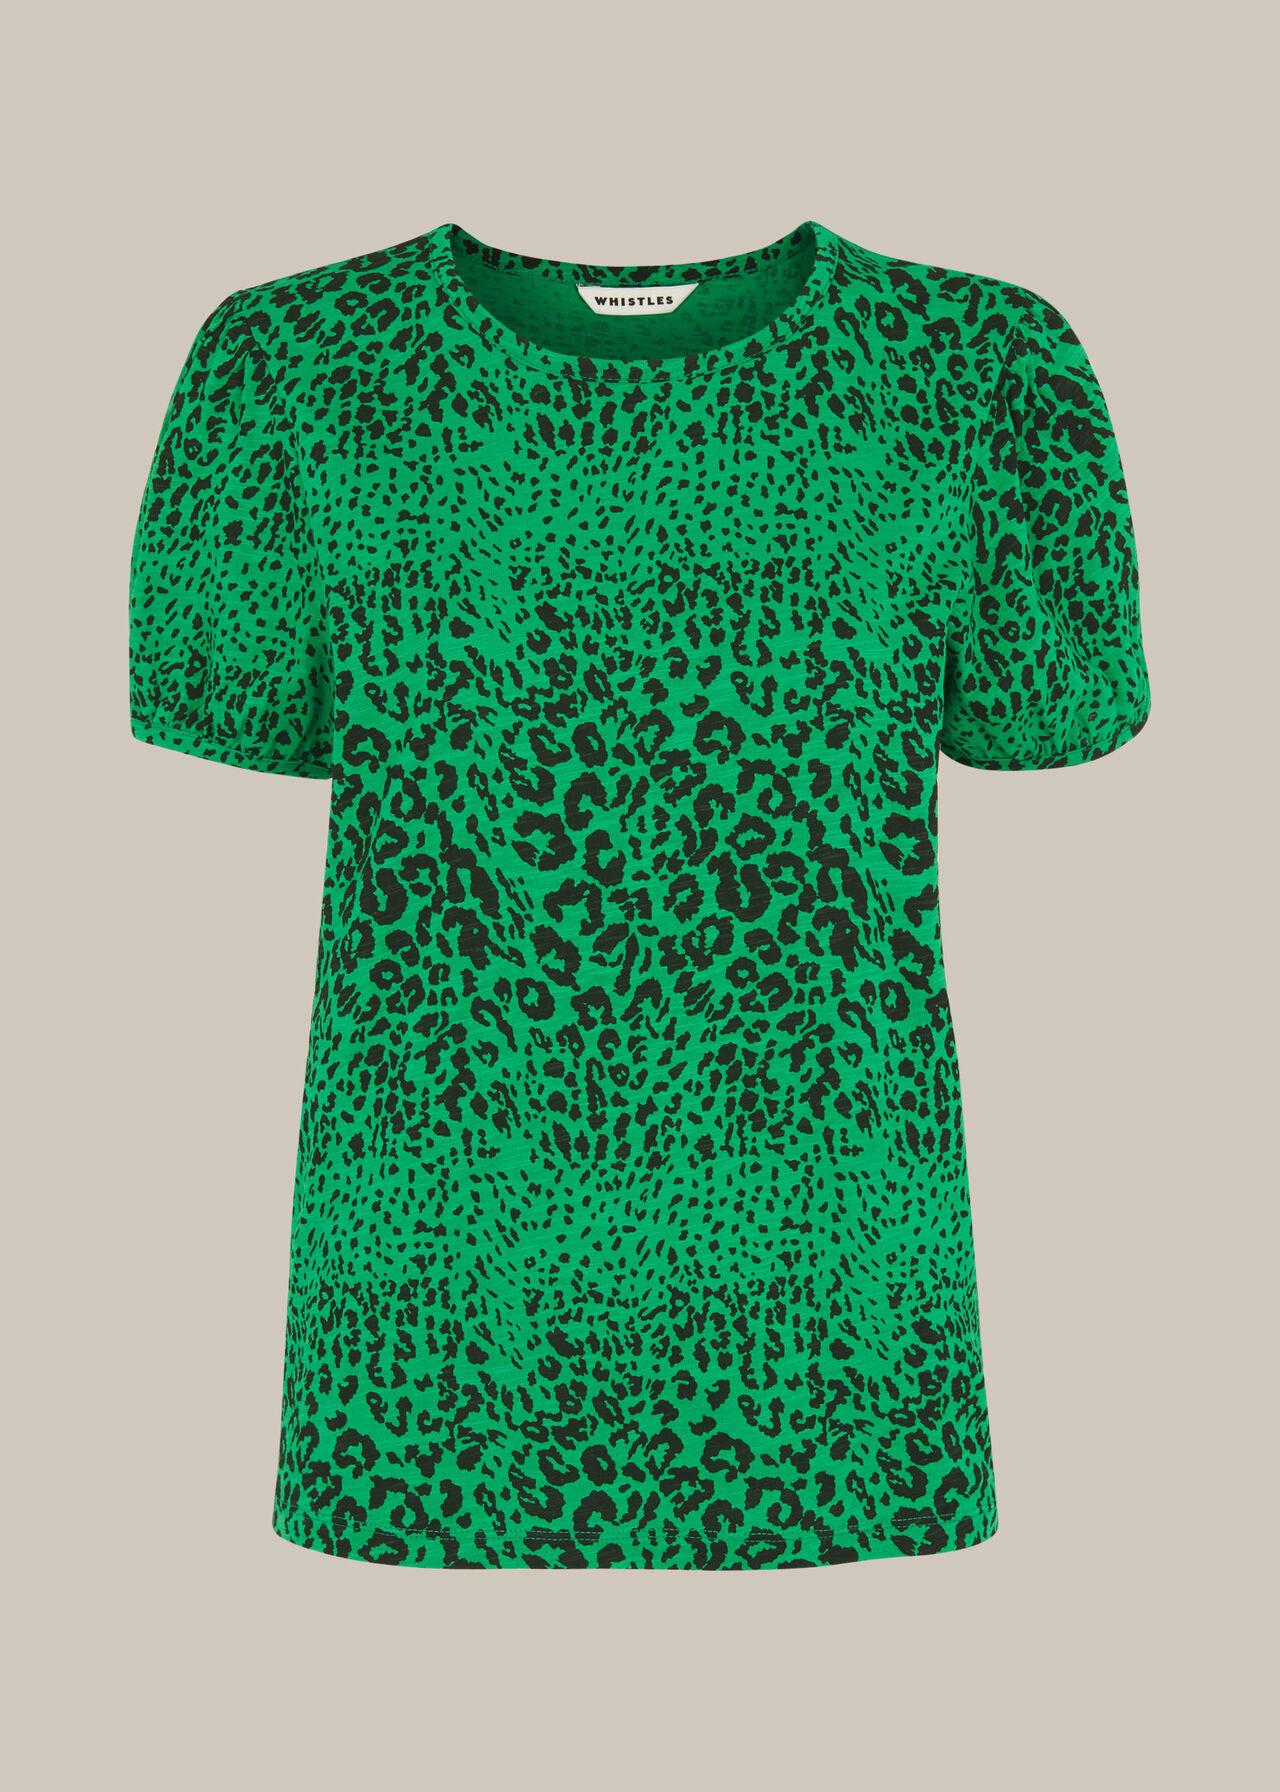 Speckled Animal Puff Tshirt